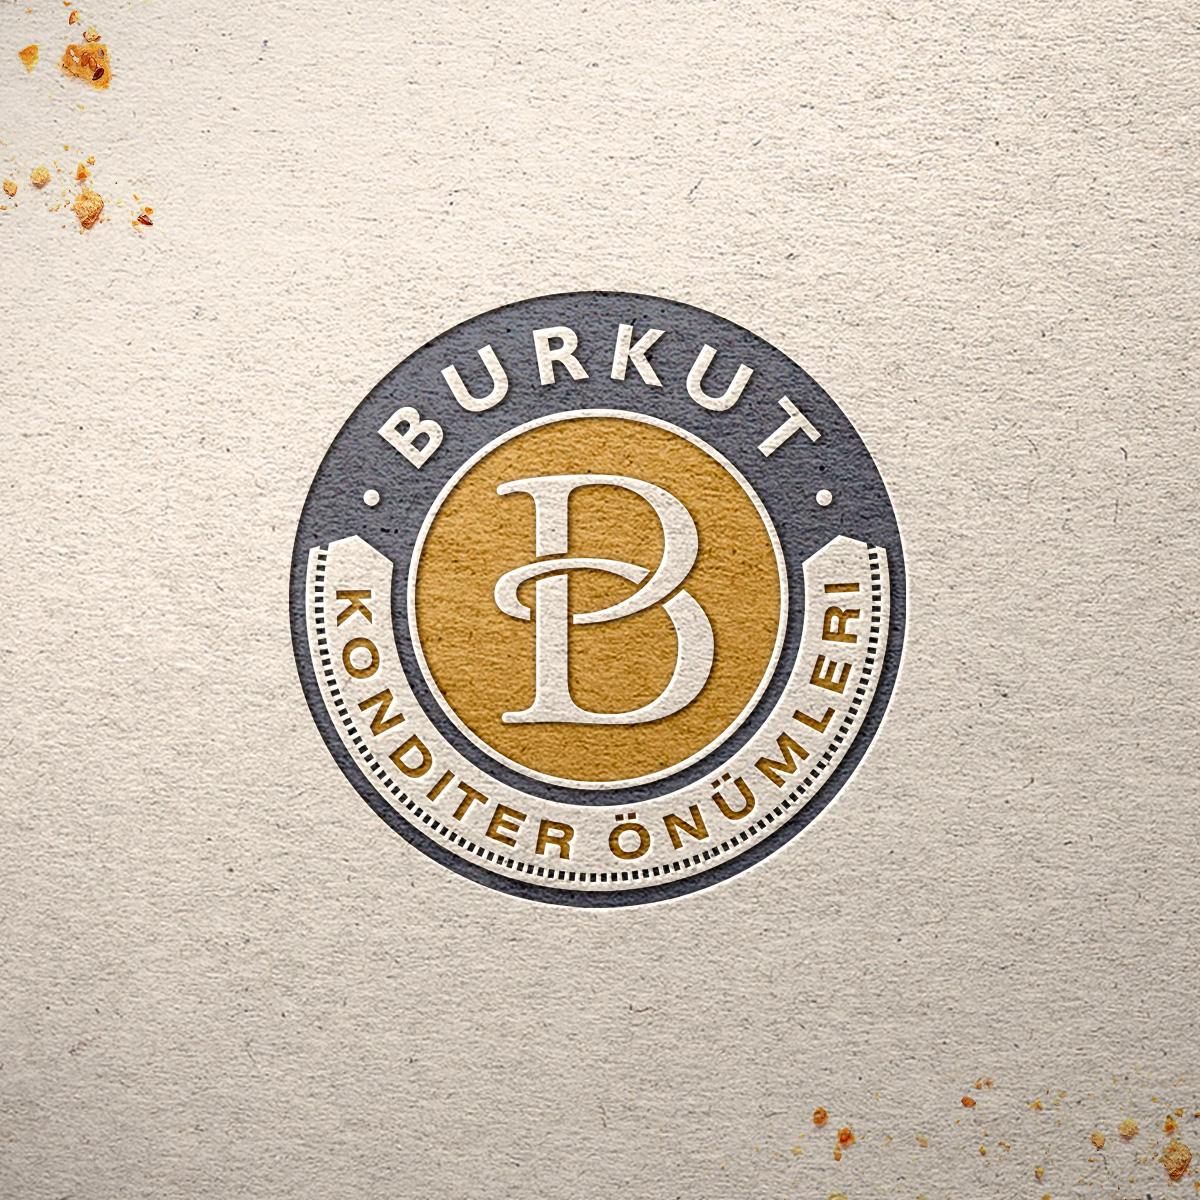 Burkut. Logo for a candy company